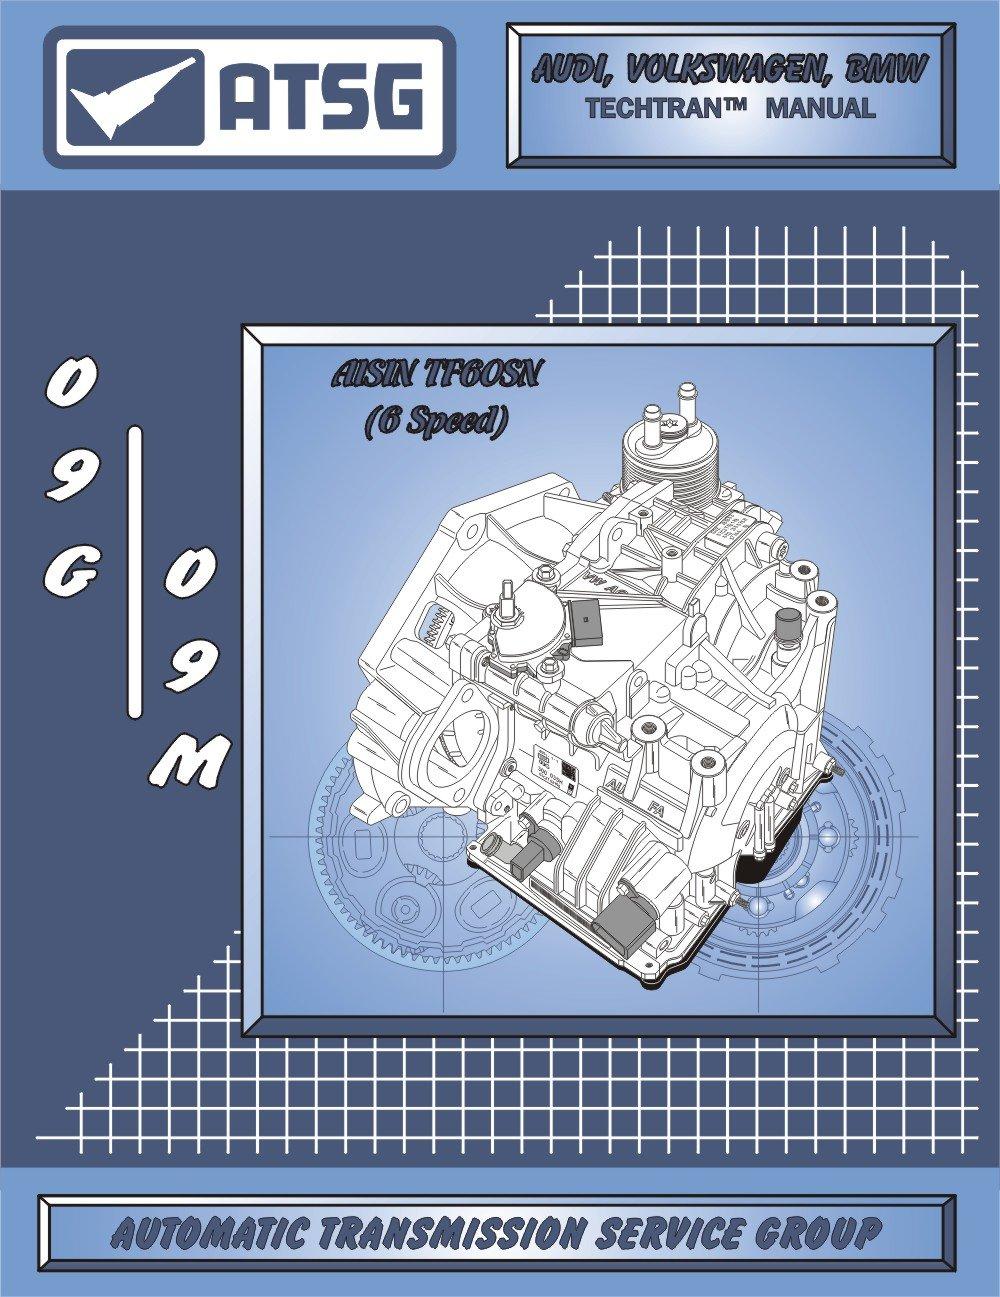 atsg vw 09g 09m techtran transmission rebuild manual audi rh amazon com ATSG Automatic Transmission Repair Manual ATSG Automatic Transmission Repair Manual